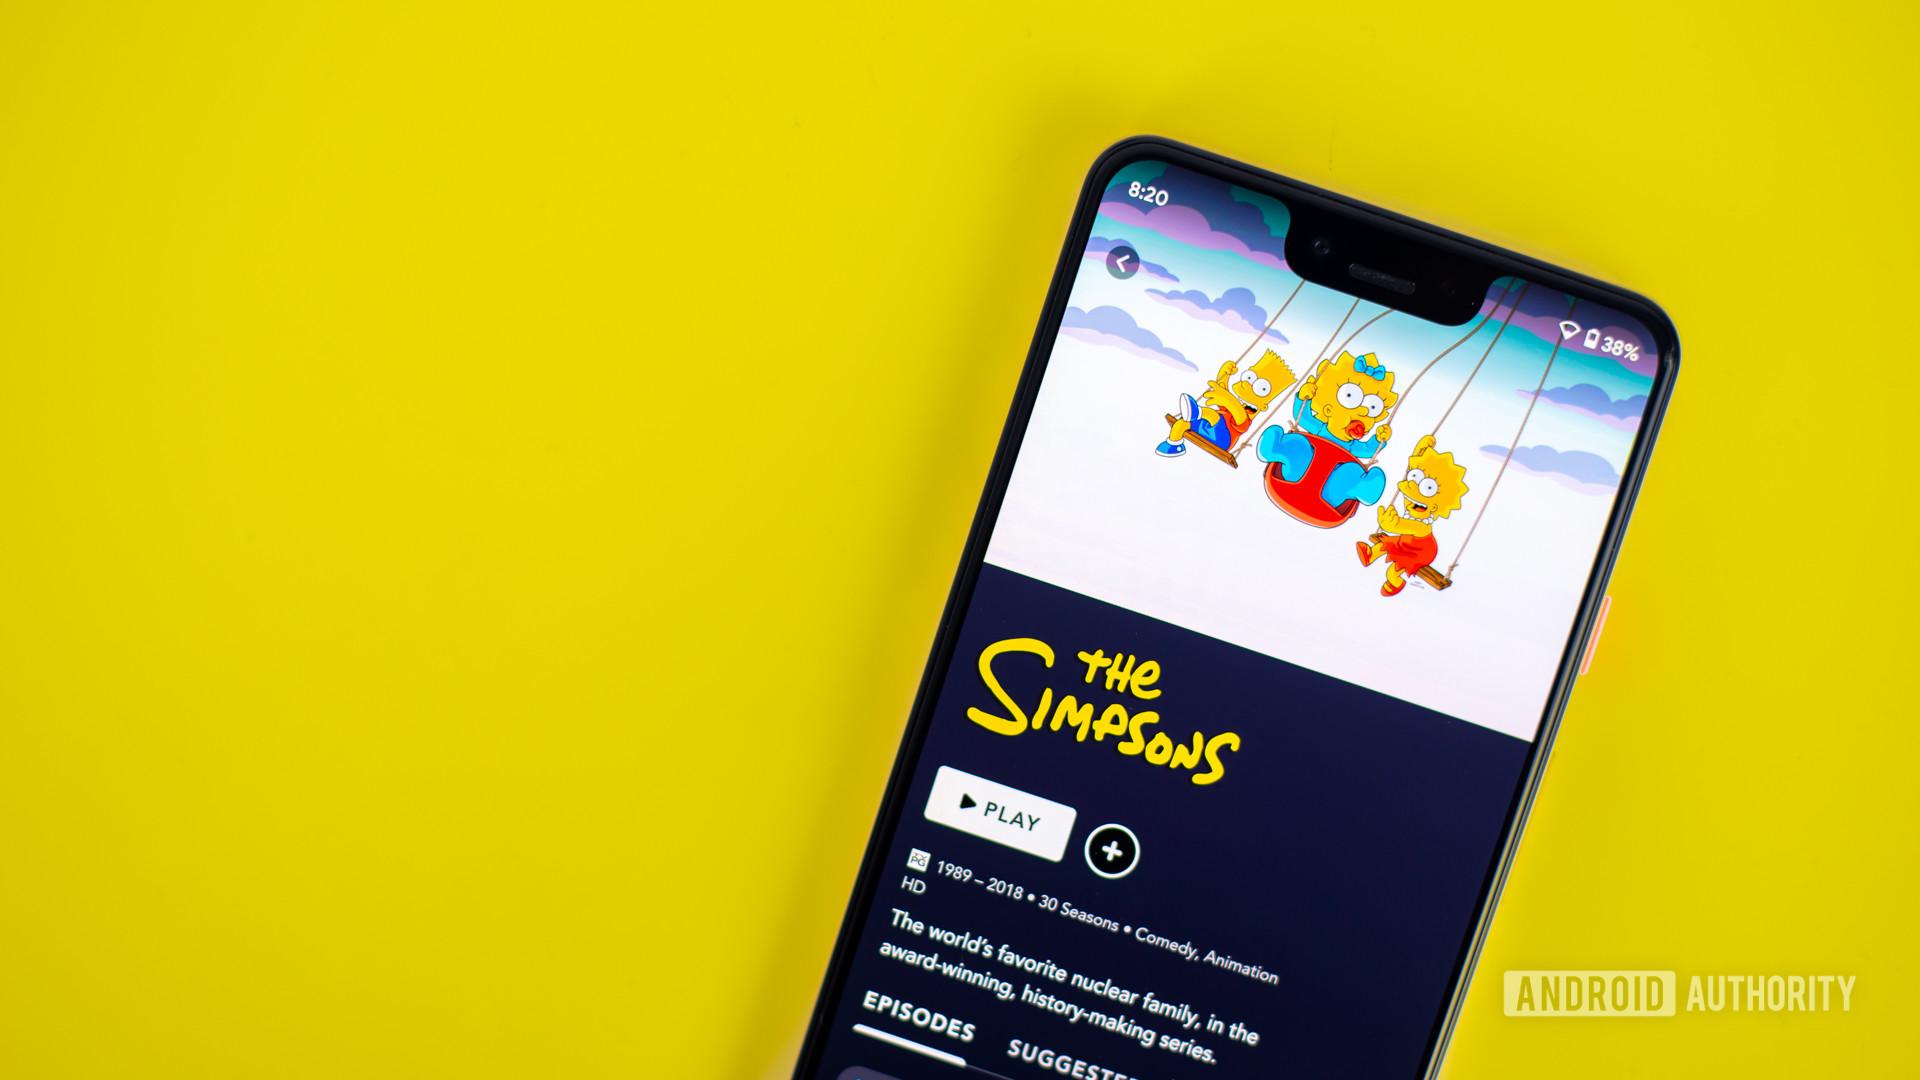 The Simpsons on Disney Plus app 2